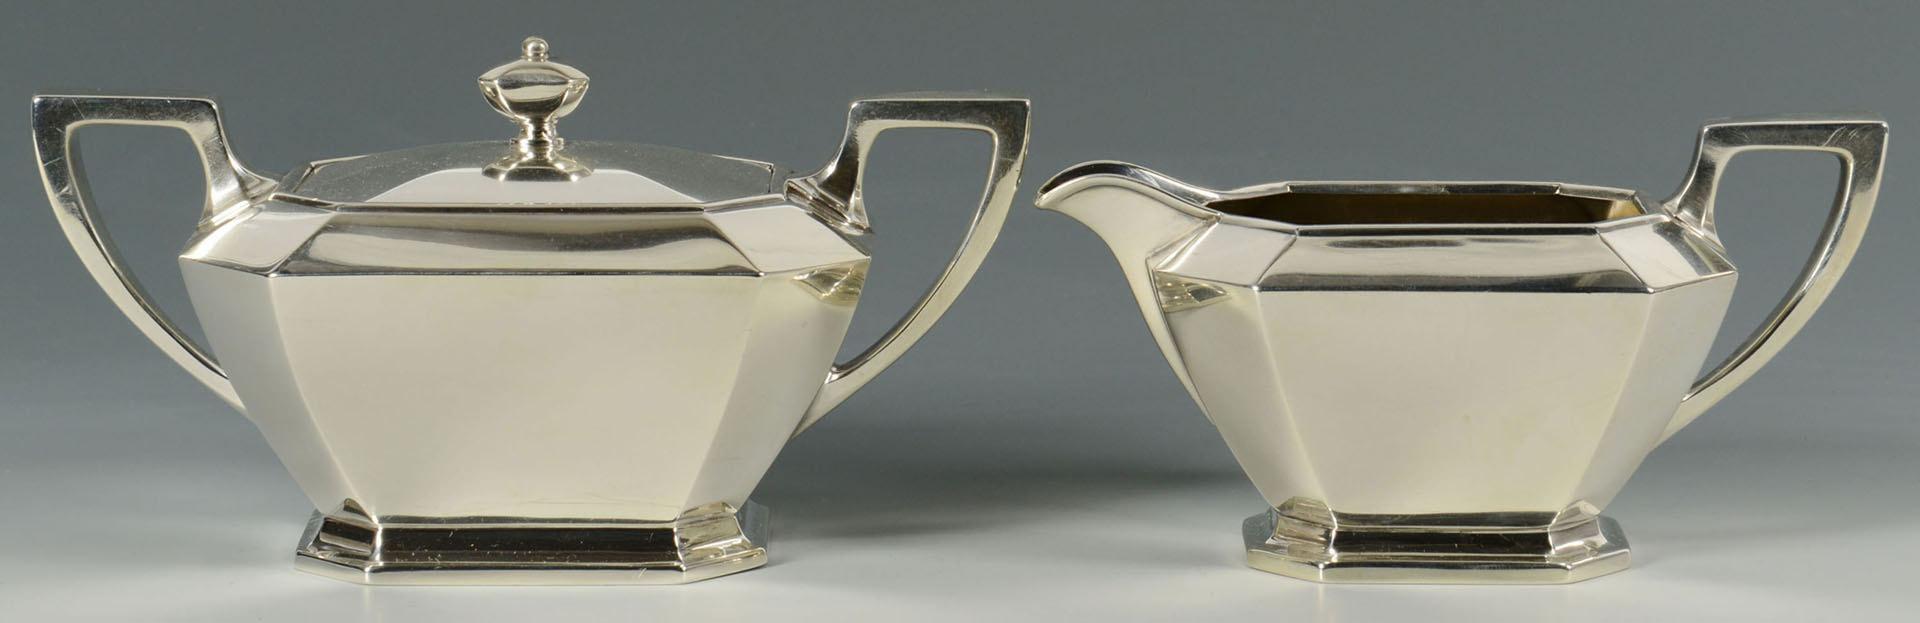 Lot 68: Gorham Fairfax 3-pc sterling tea set